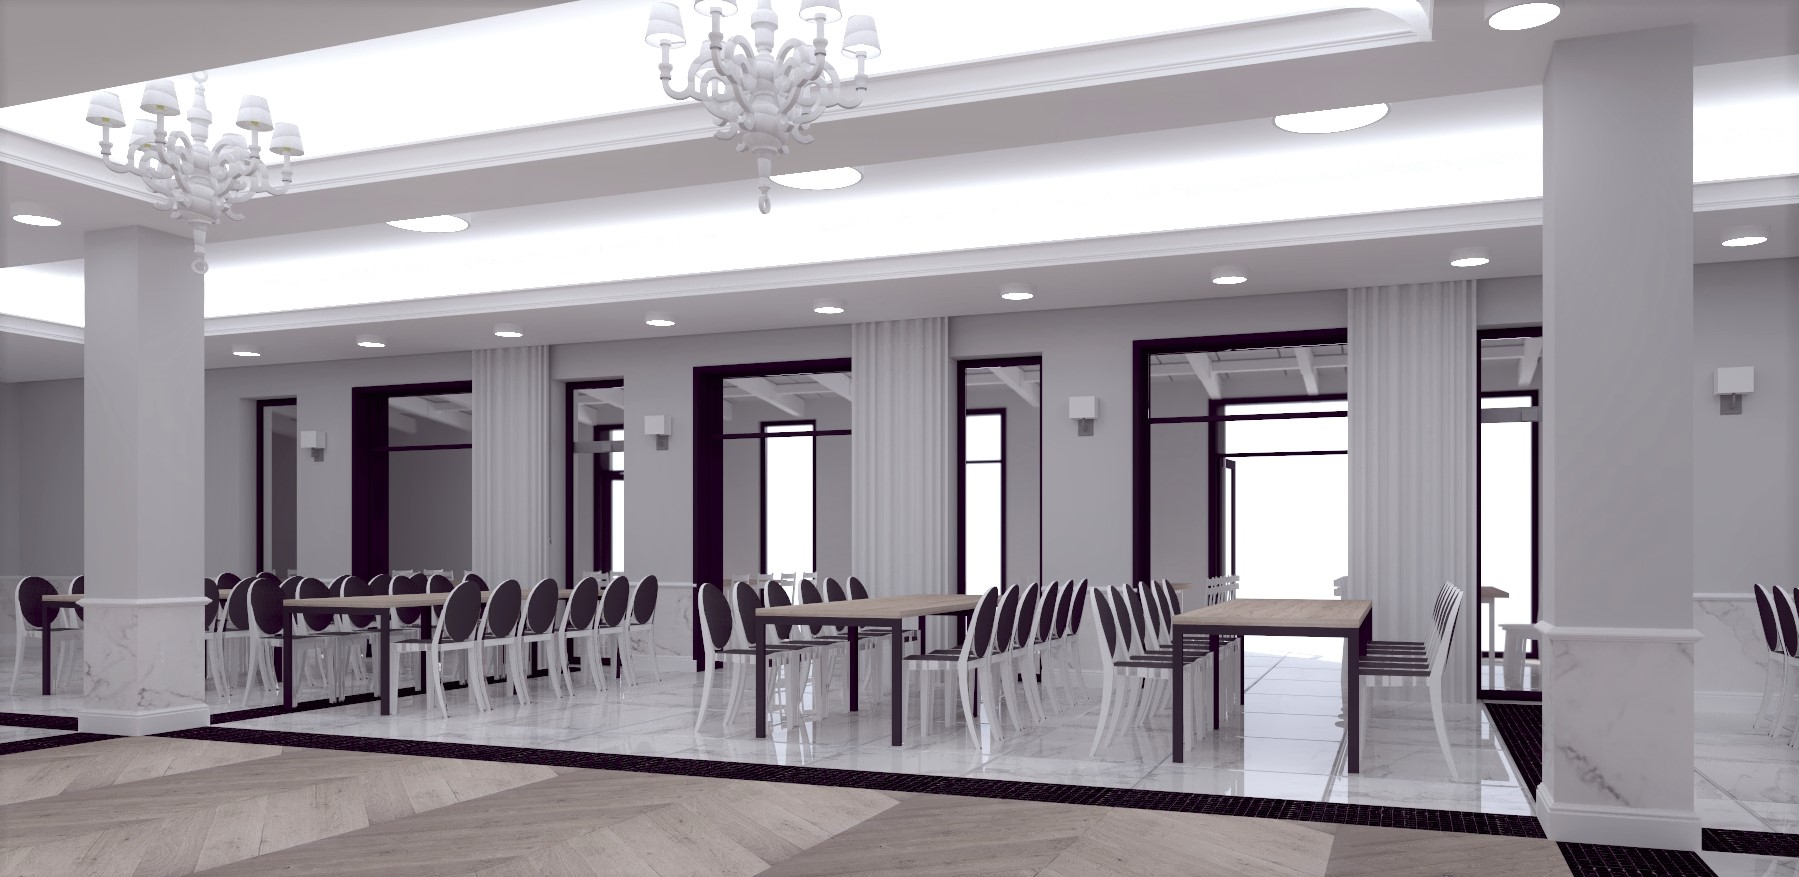 Nowa sala weselna